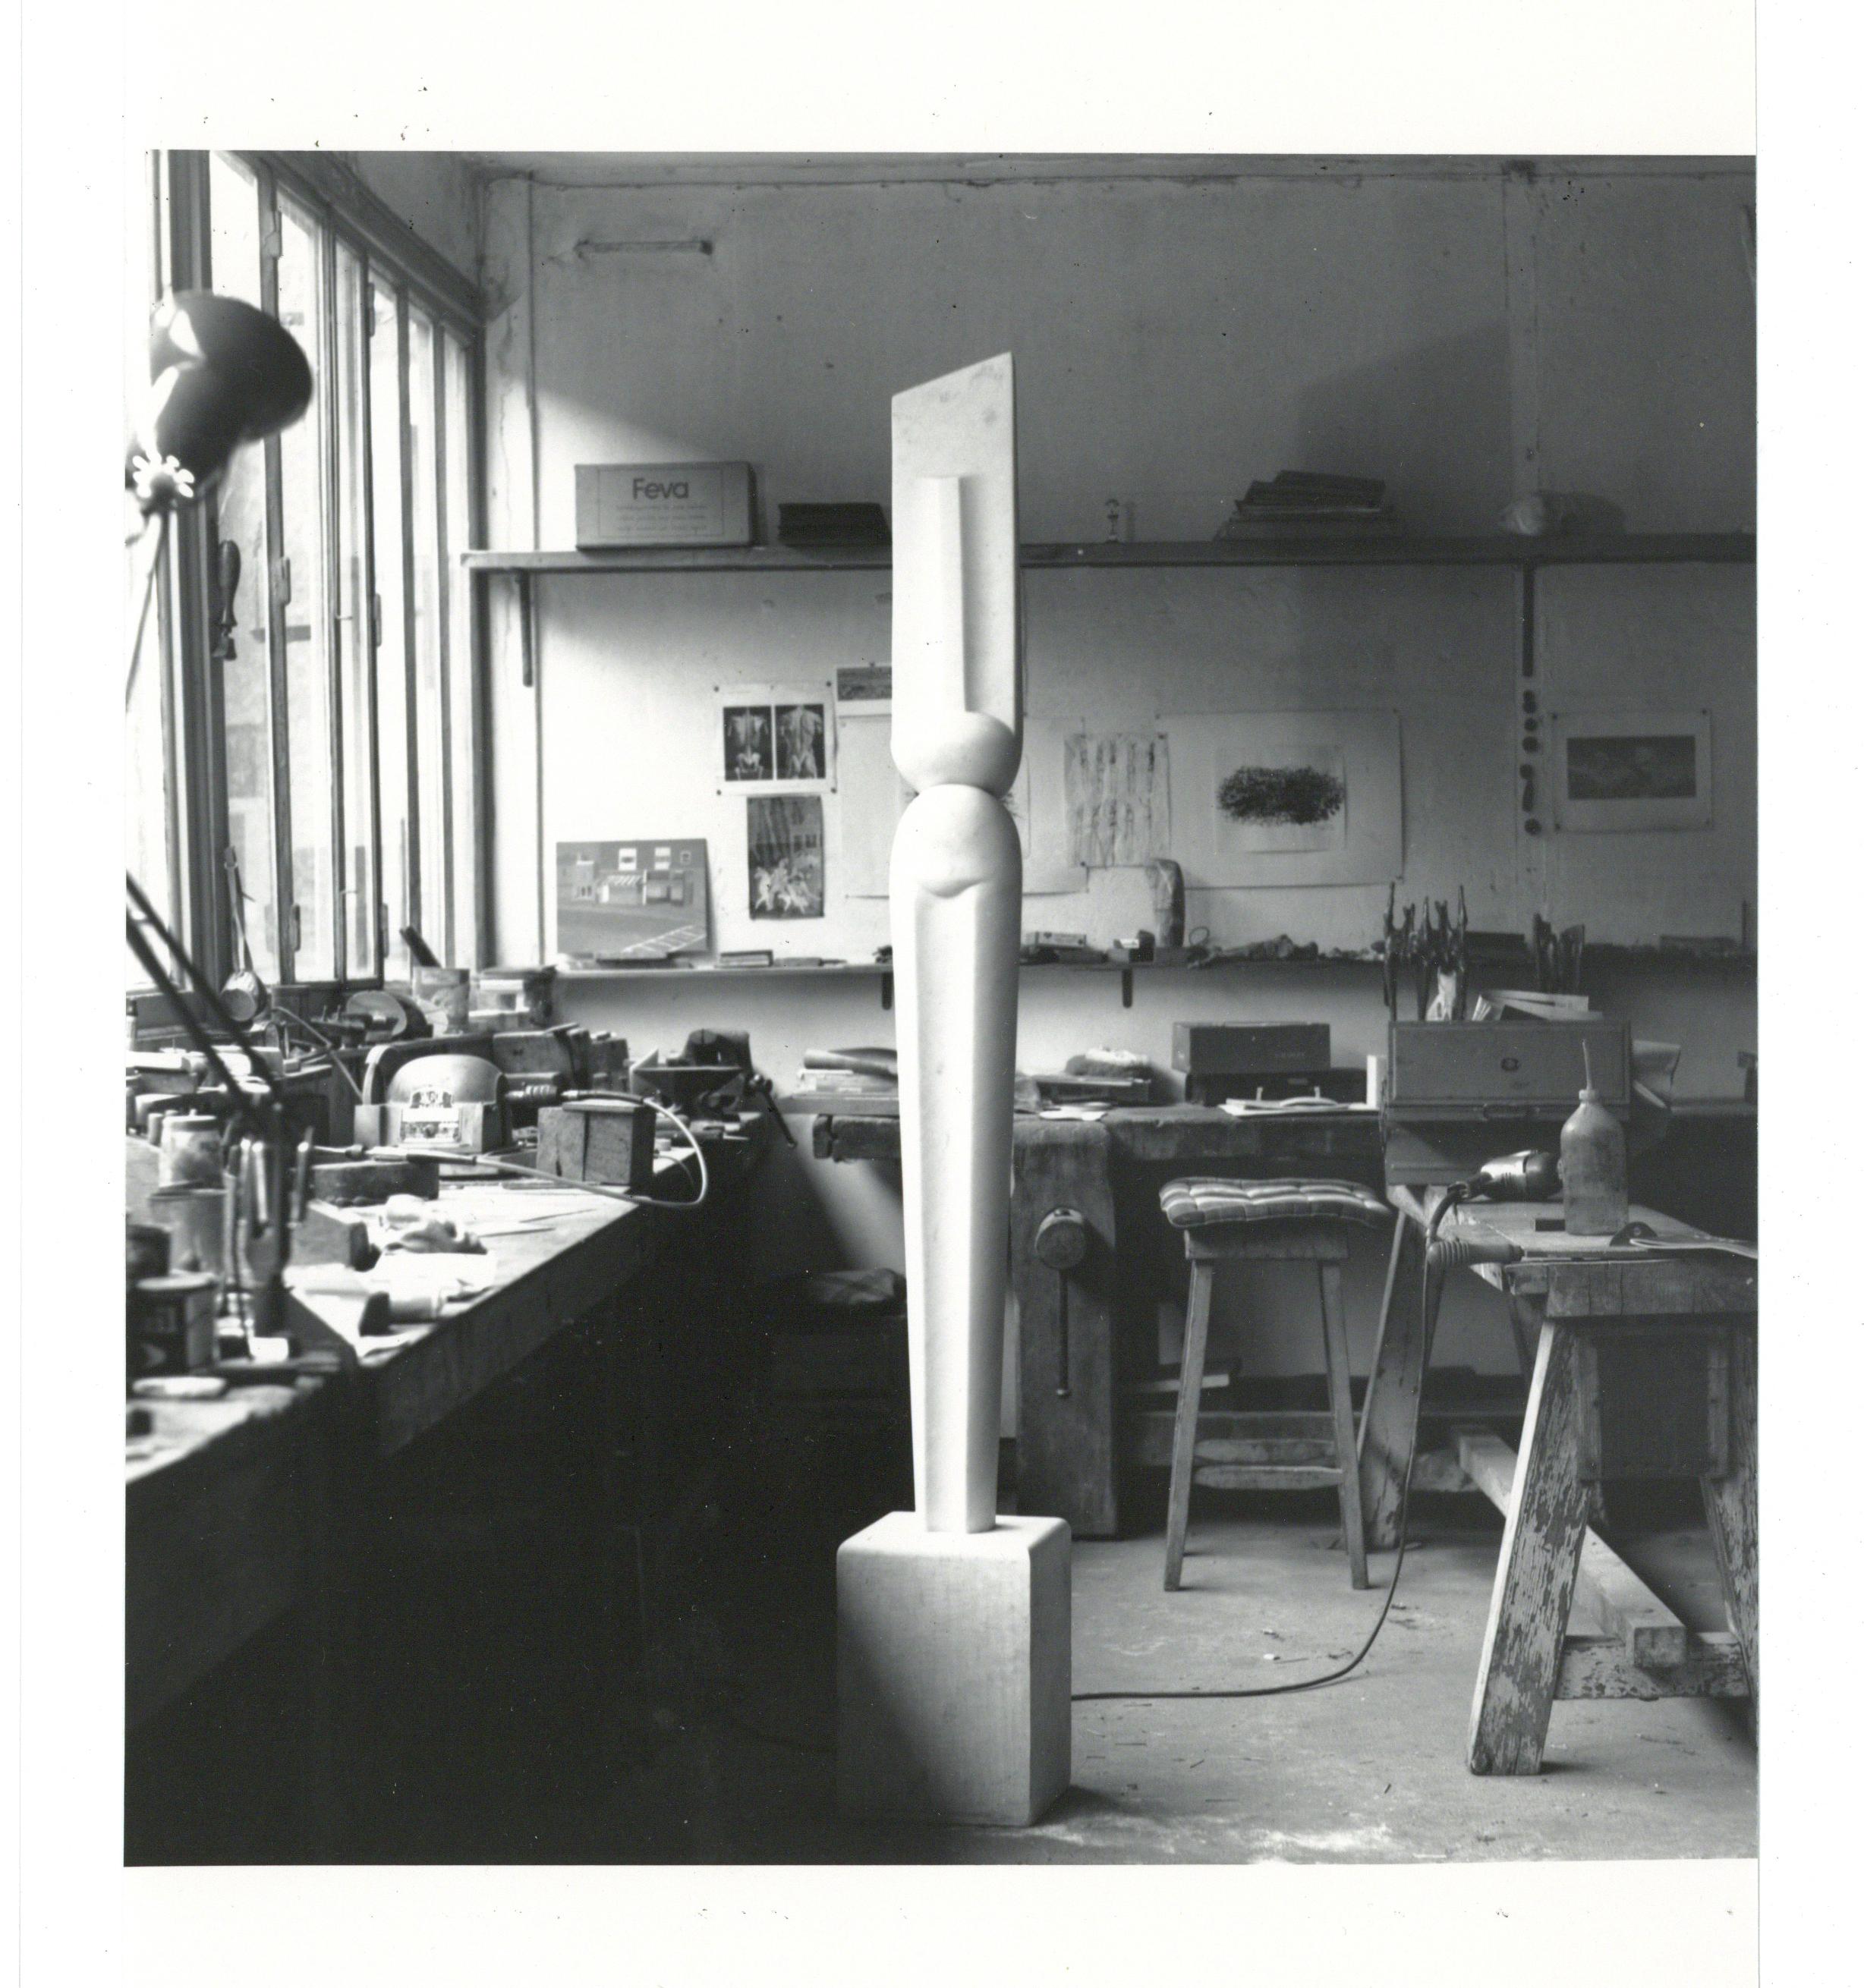 Krishna Reddy_Paris atelier in the Sixties 2_Archival print on paper_22in x 17in_Ed of 5+AP_2016